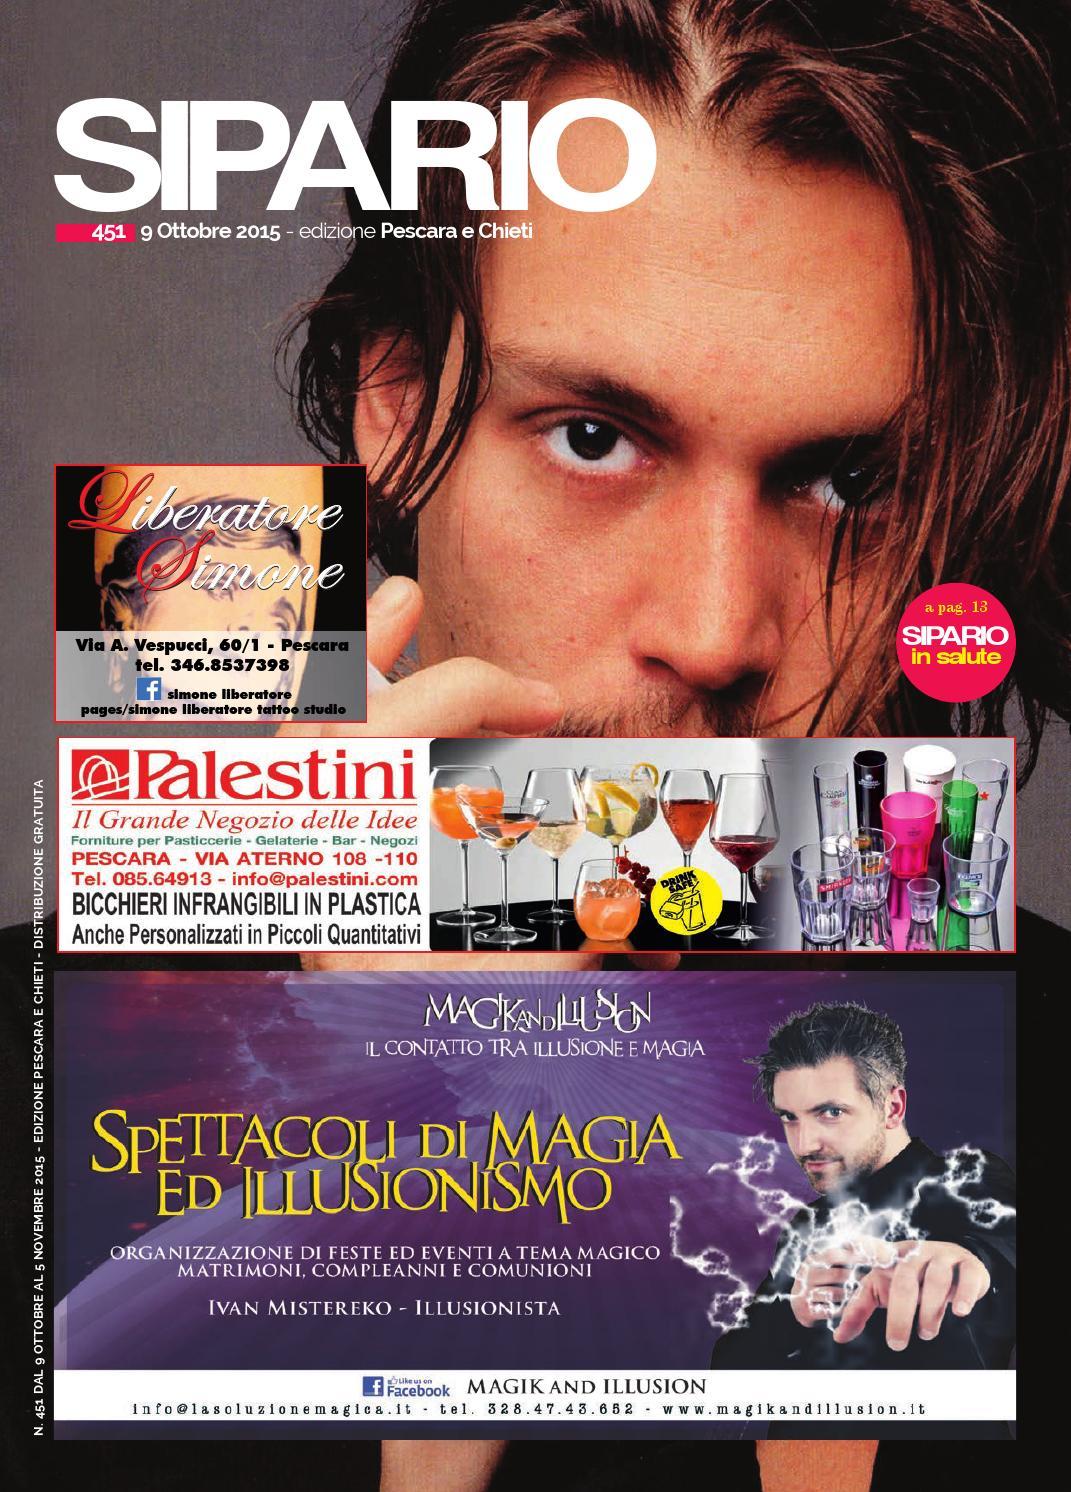 Sipario Pescara Chieti ottobre 2015 by Publipress srl - issuu 85f27424d18b